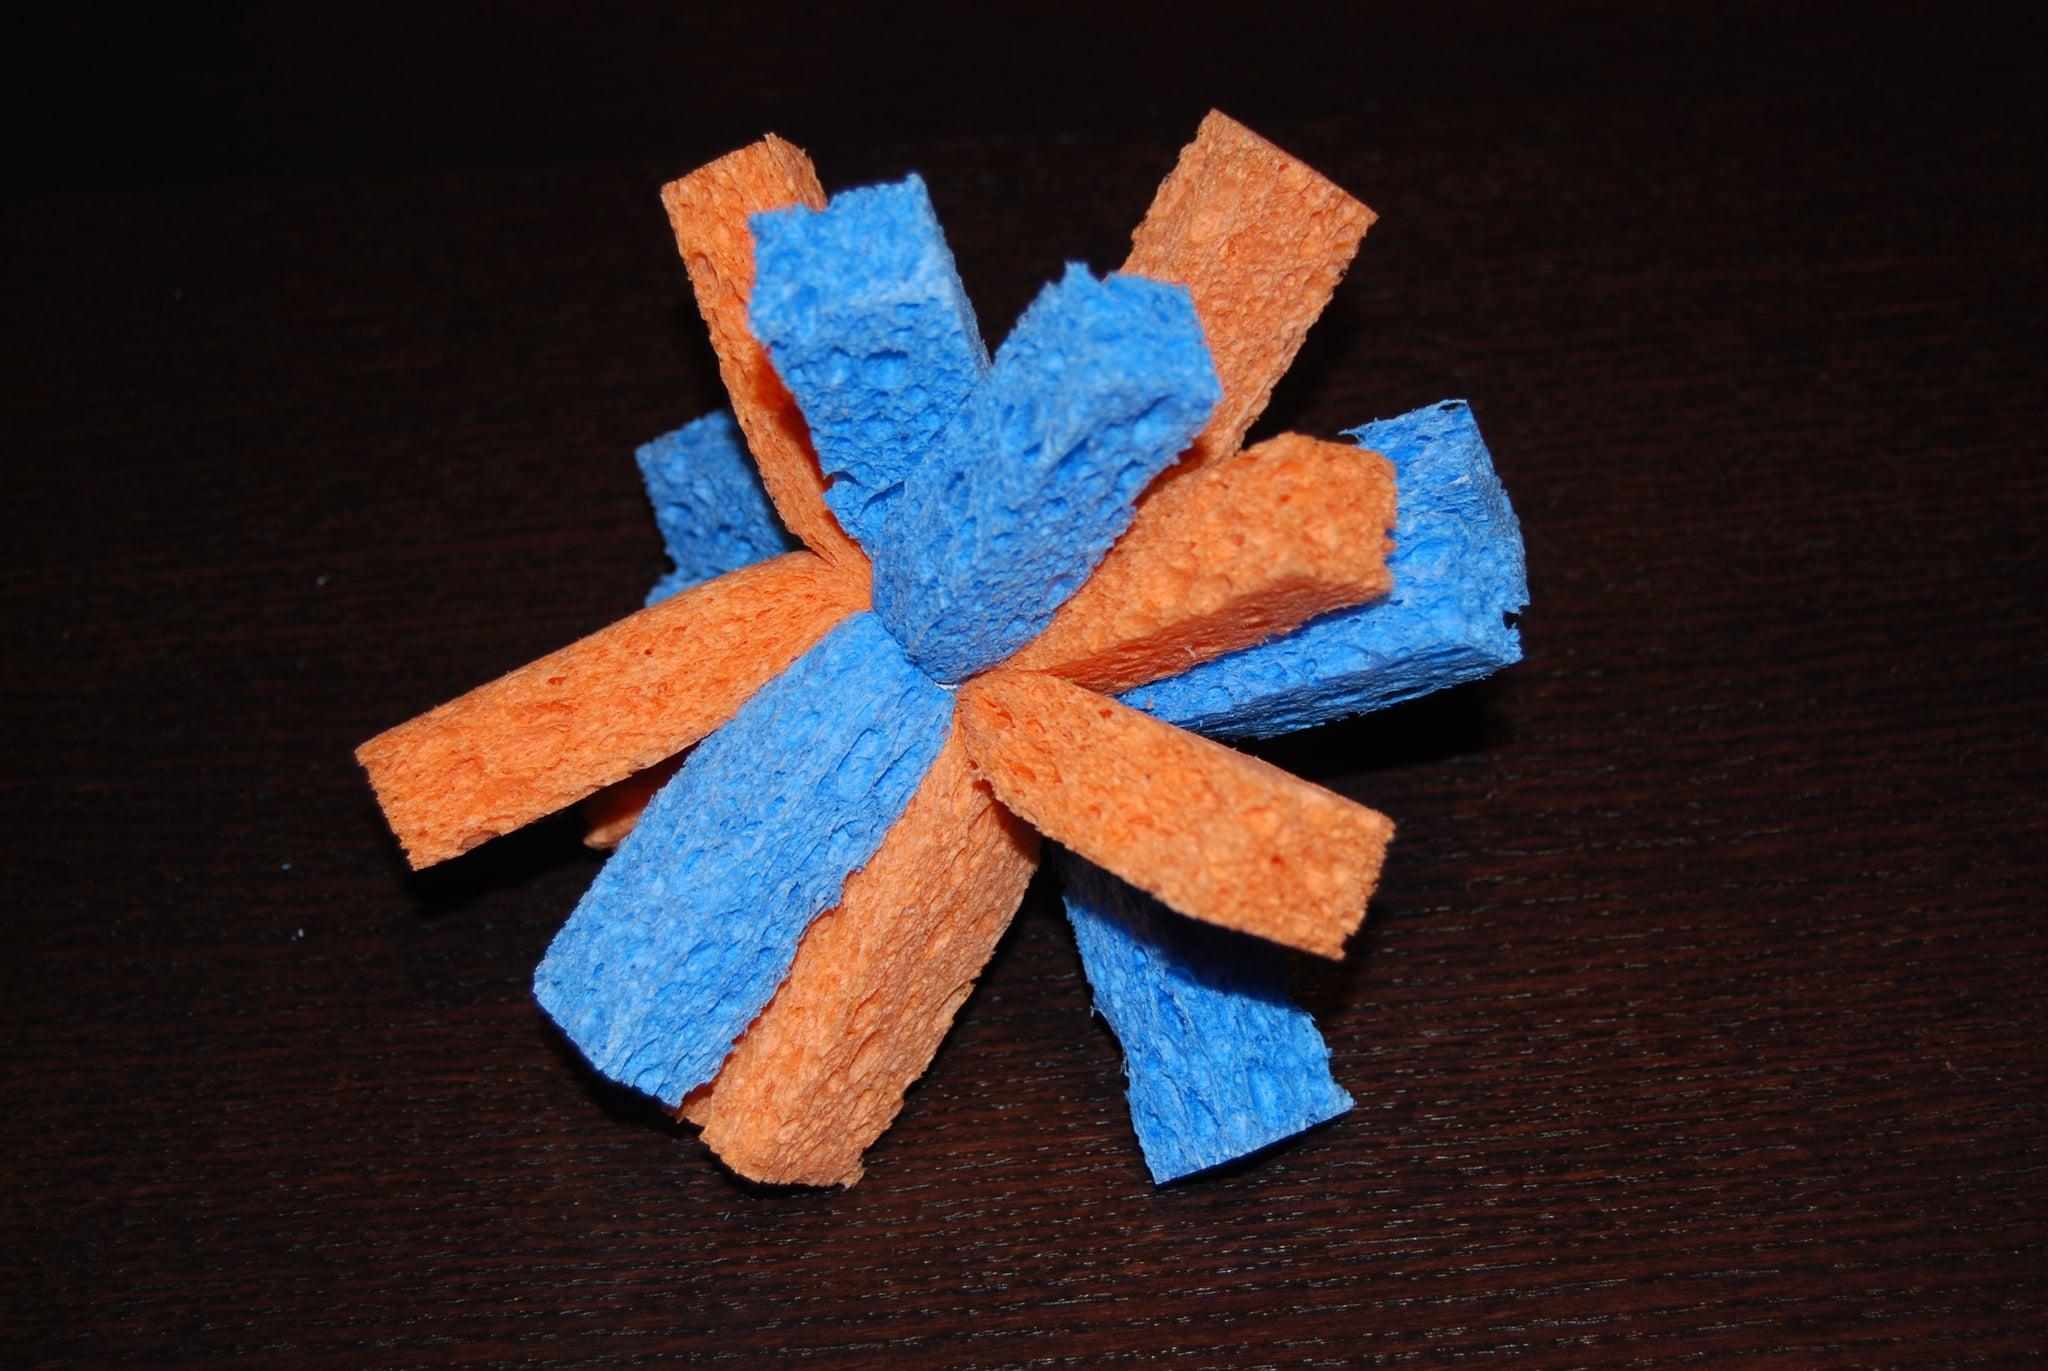 Blue and orange sponge